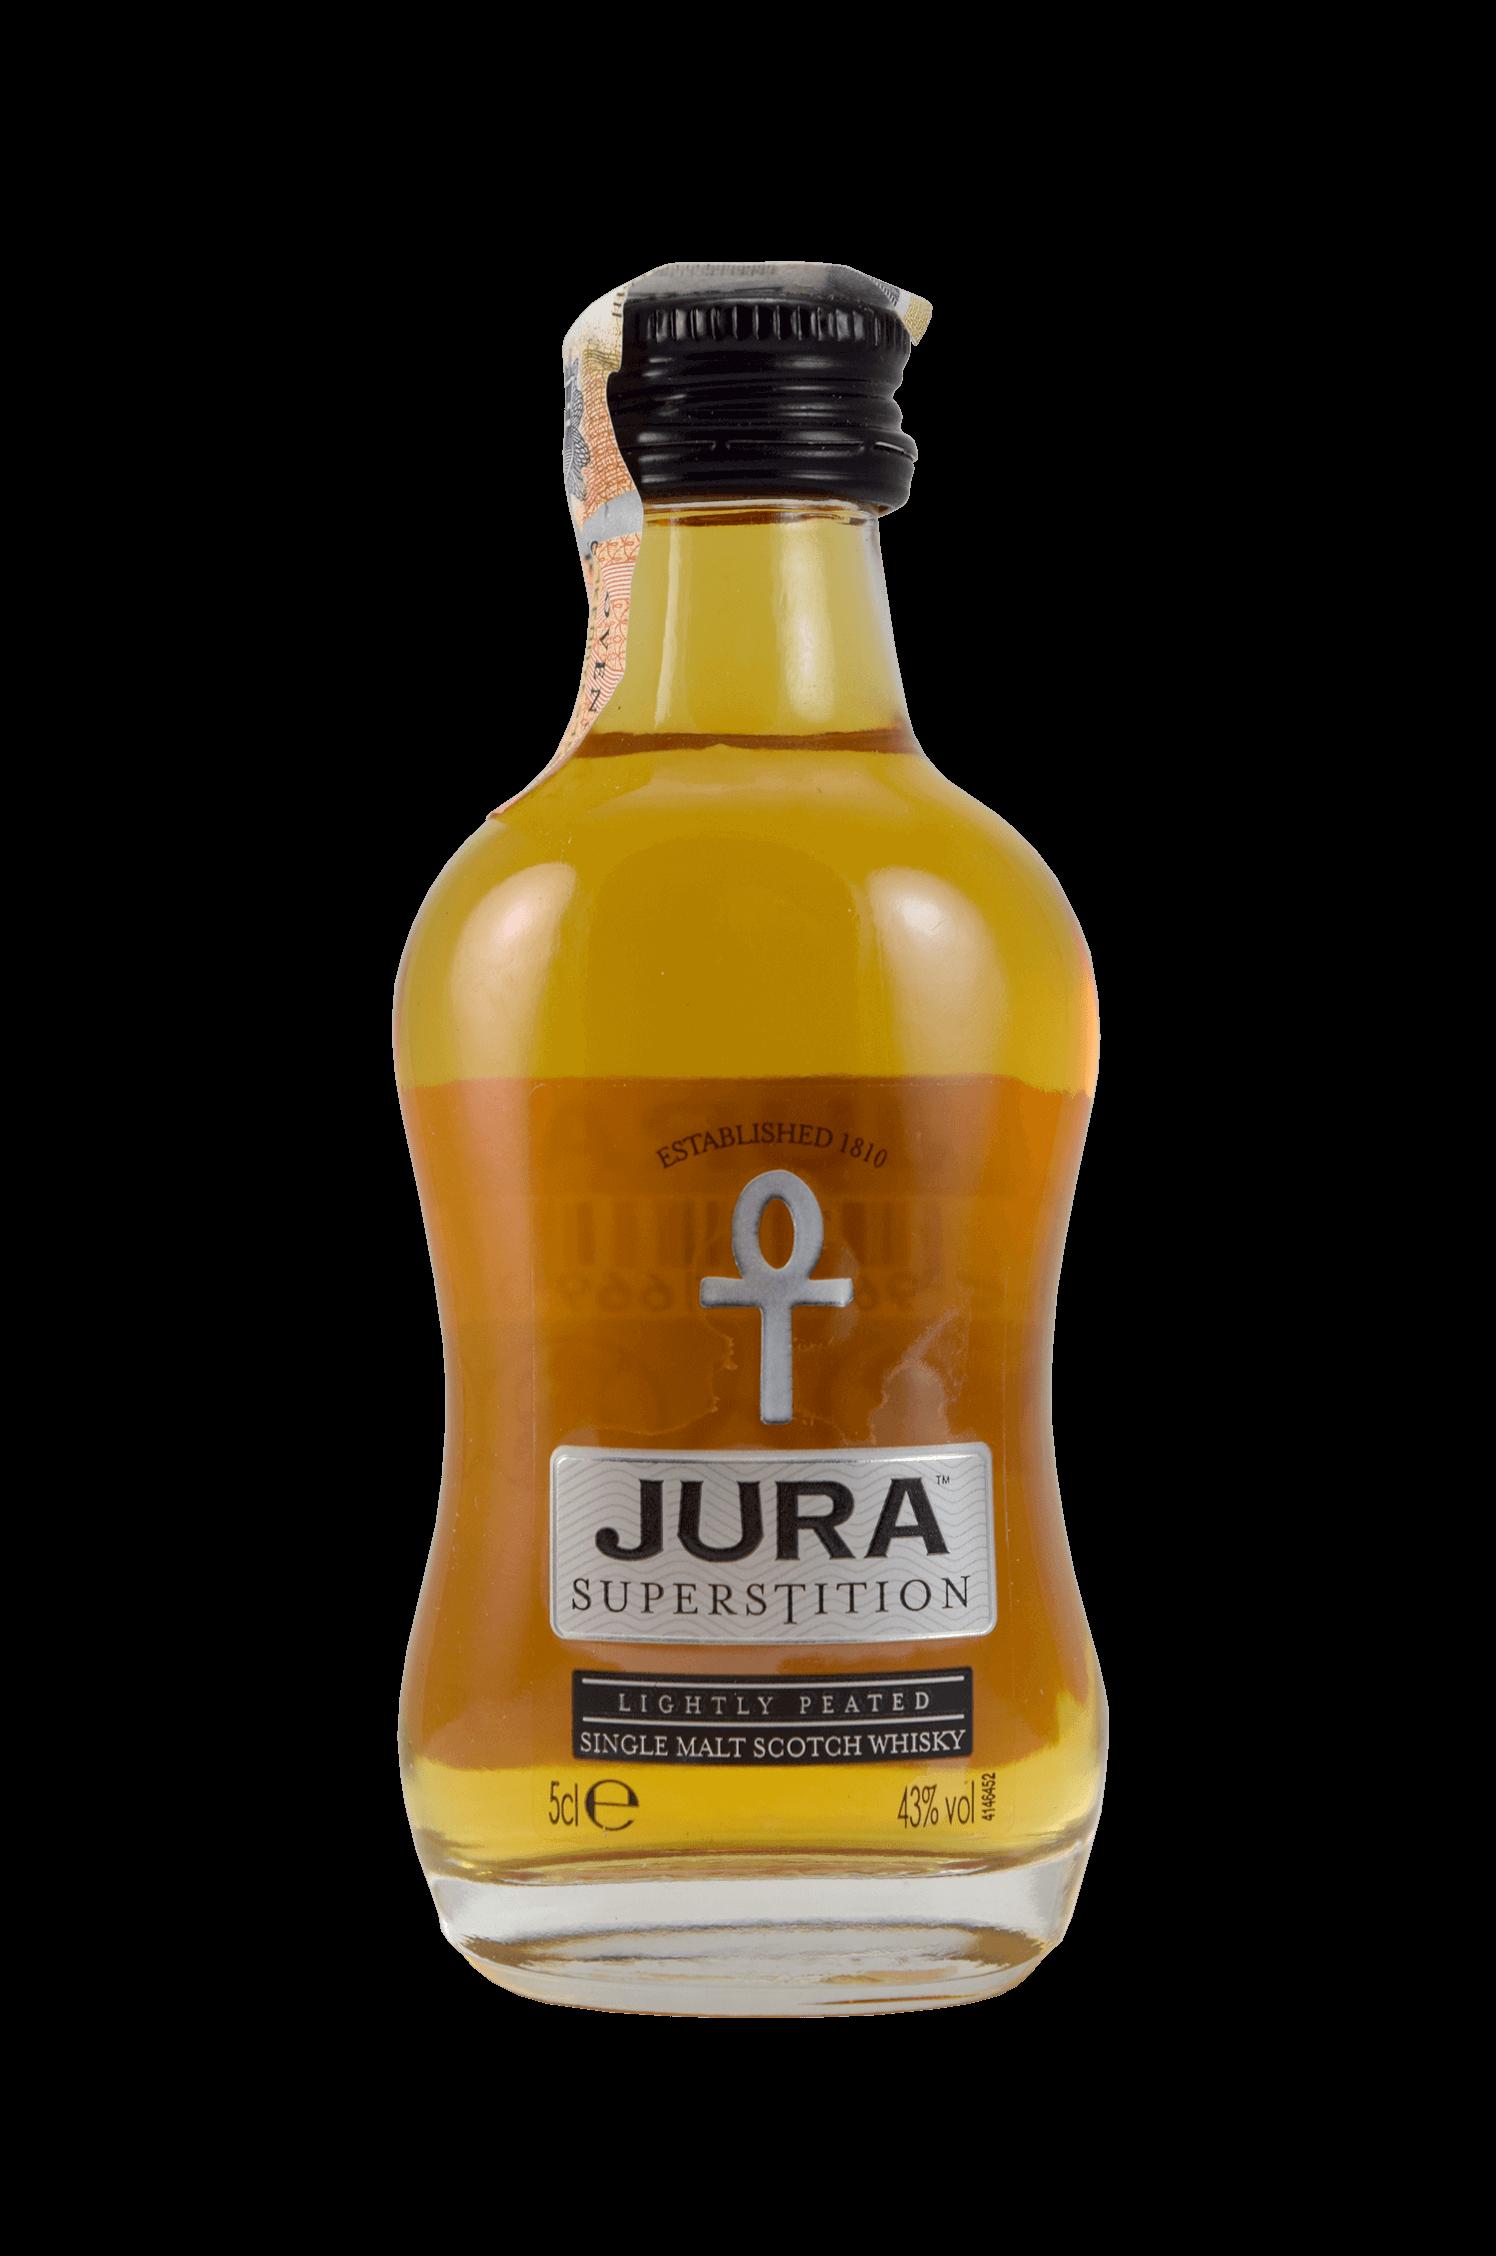 Jura Superstition Whisky